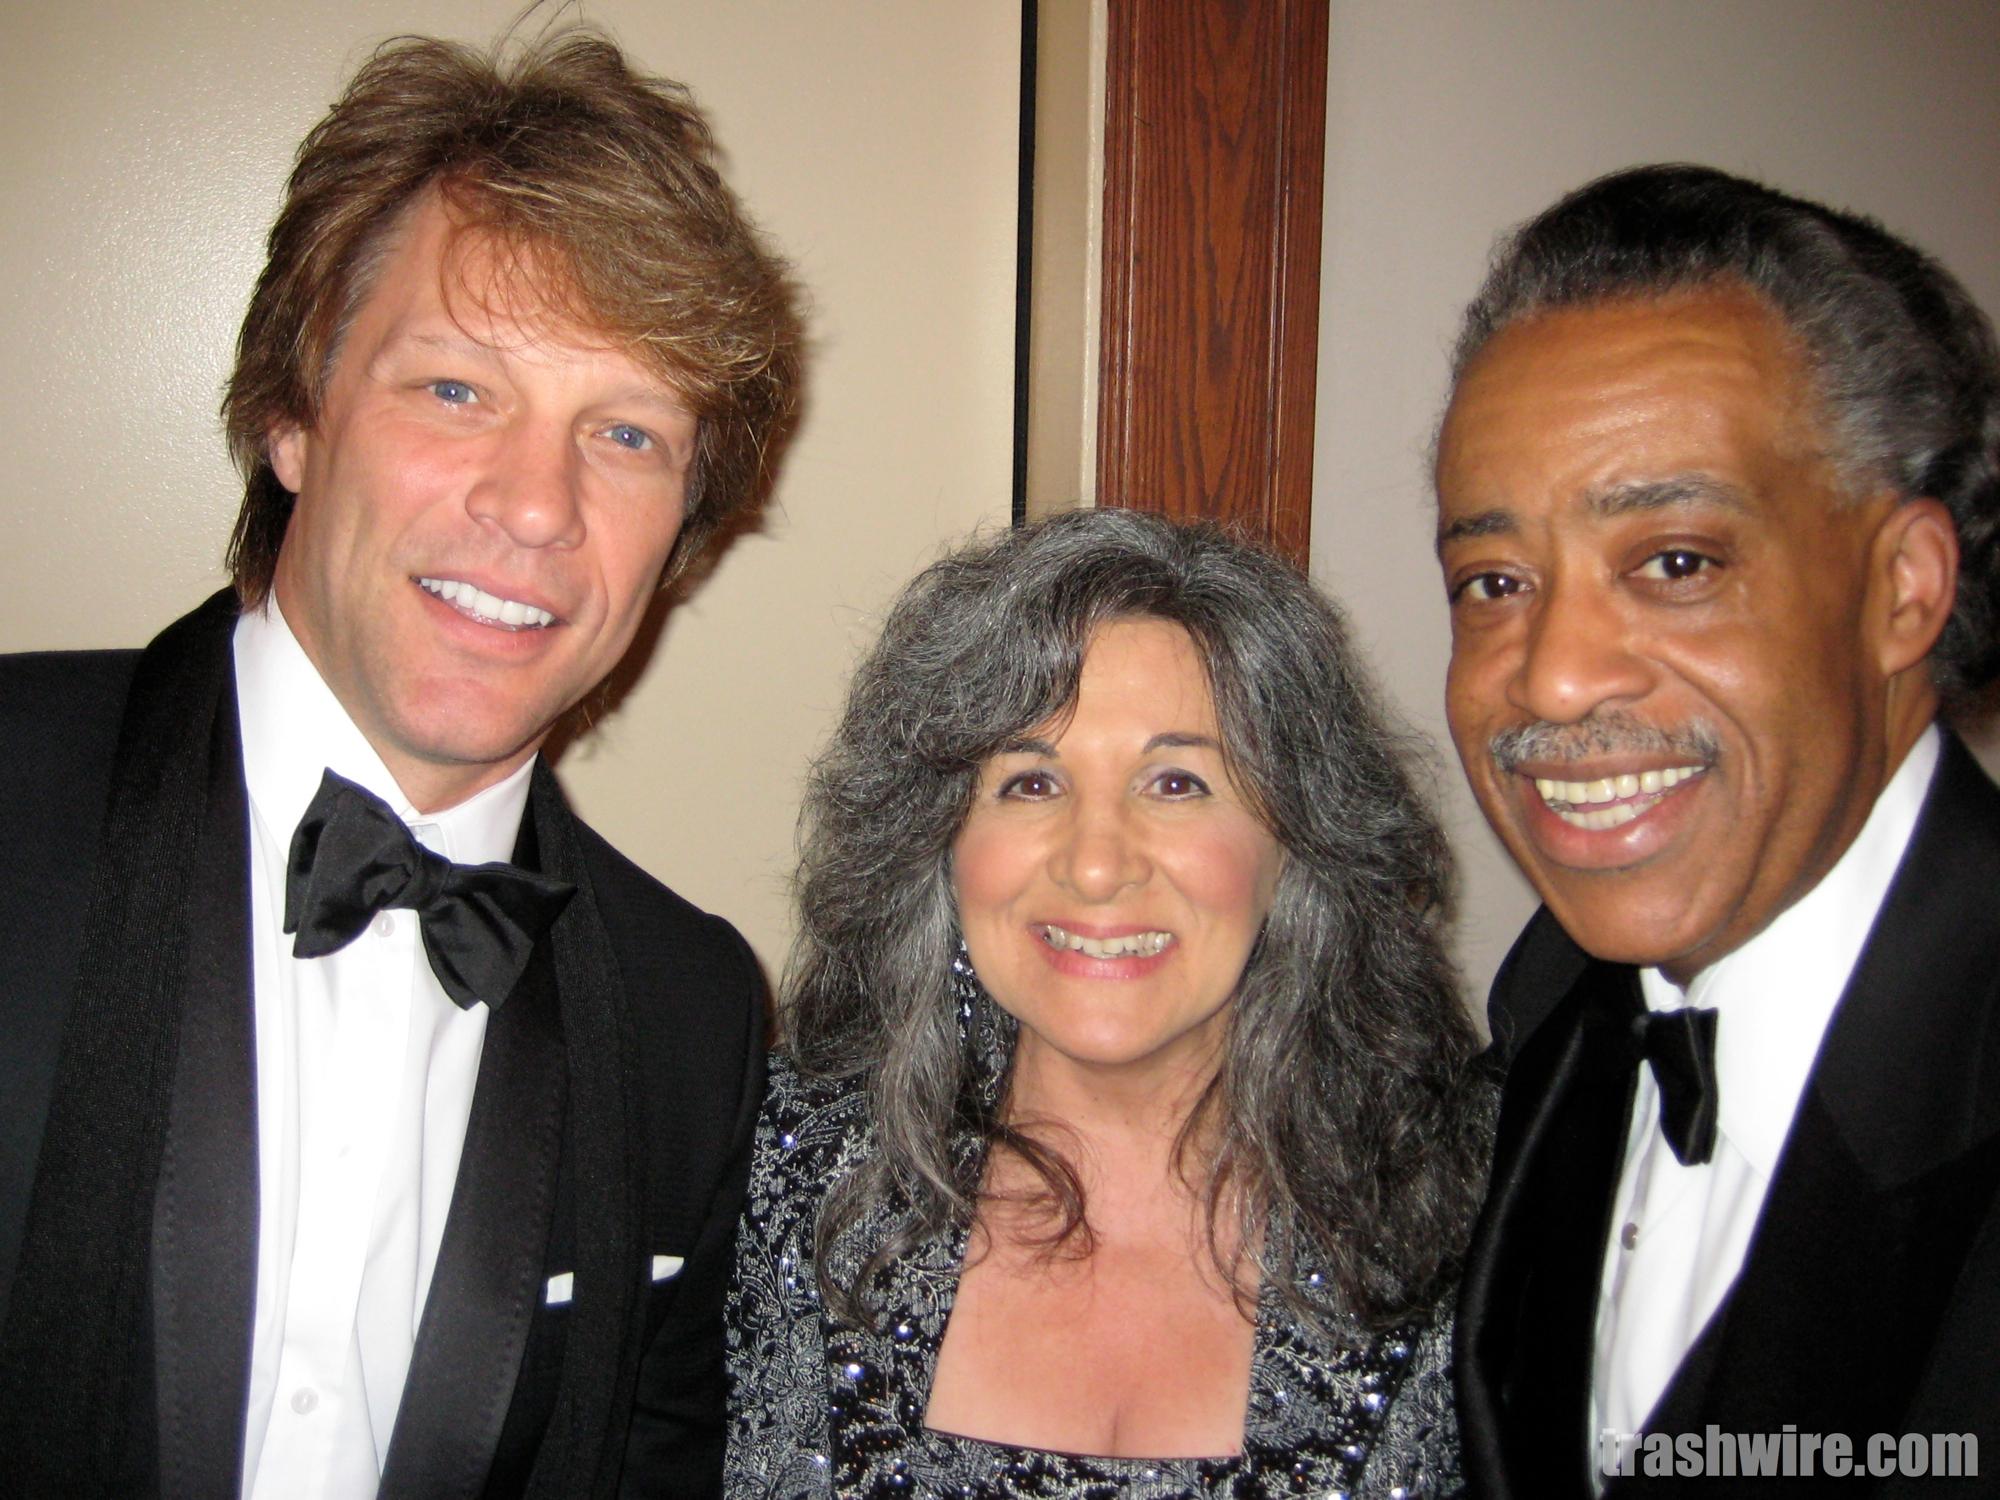 Pat Sue and Jon Bon Jovi and Al Sharpton